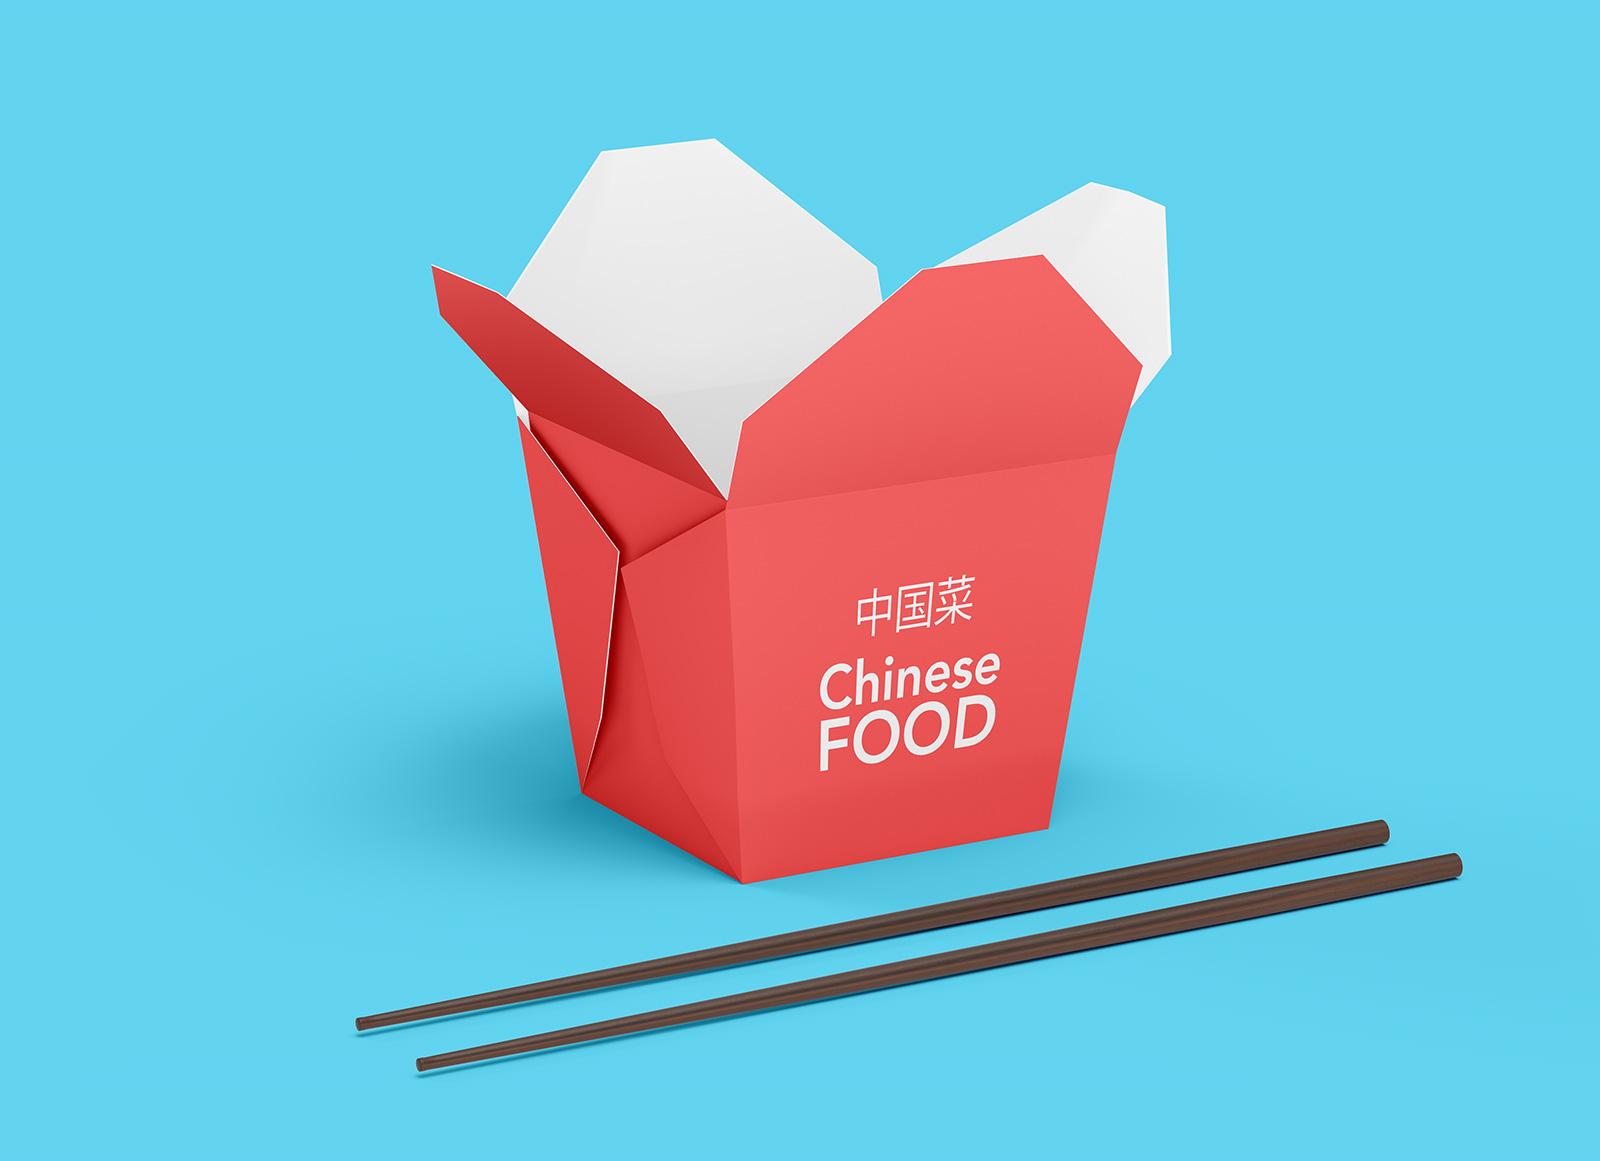 15 Noodles Box Cup Packaging Psd Mockup Templates Decolore Net